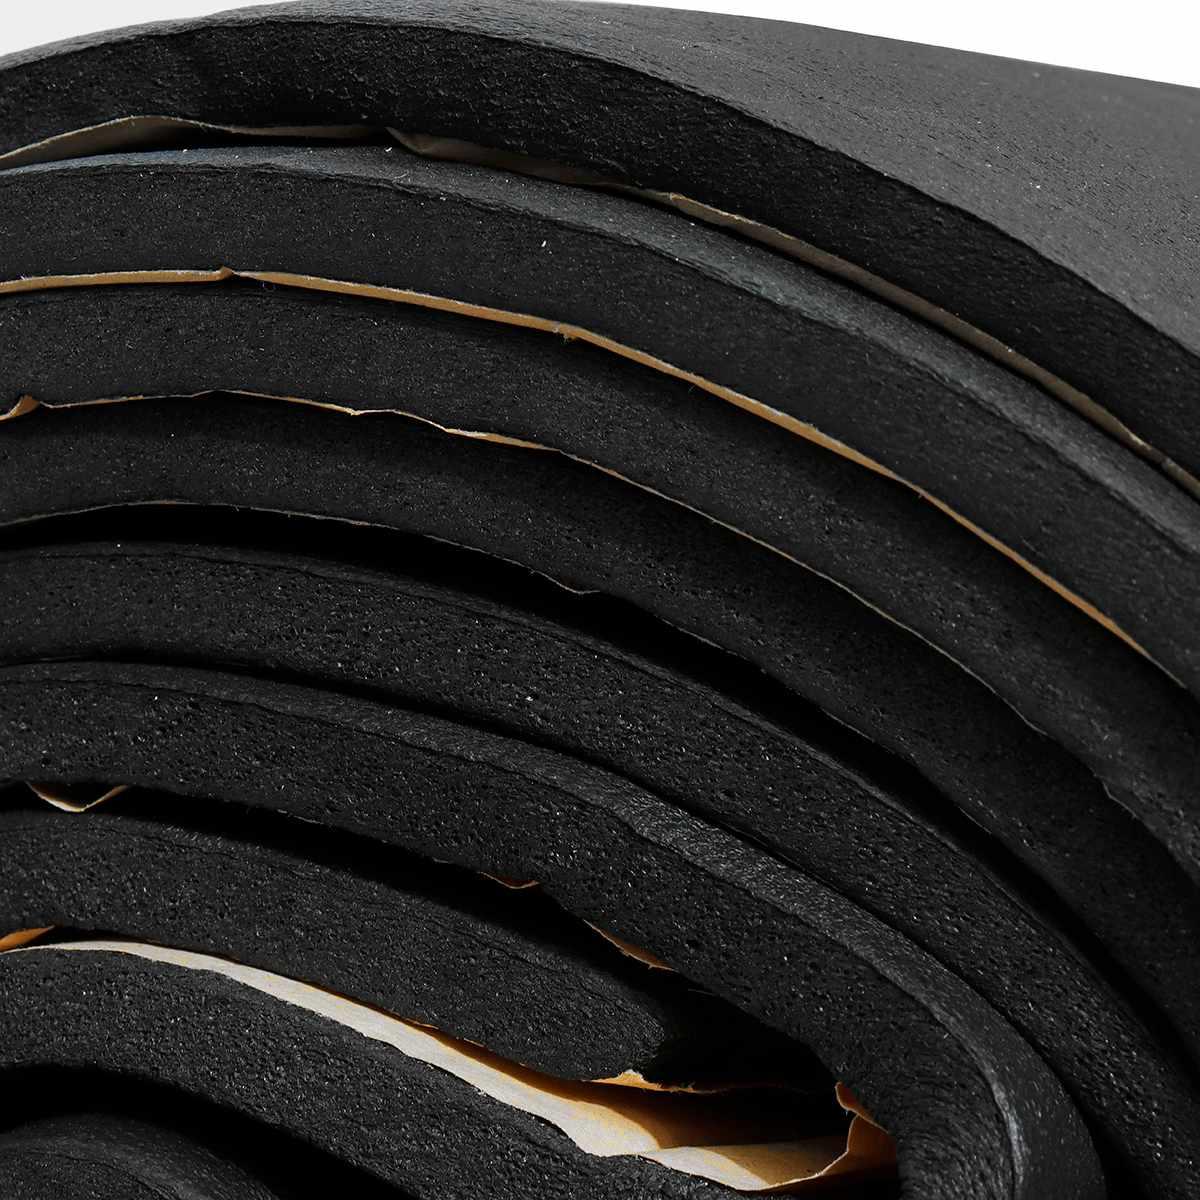 1 Roll 5mm Car Auto Sound Deadening Cotton Heat Insulation Pad Foam  Material Automobiles Interior Accessories